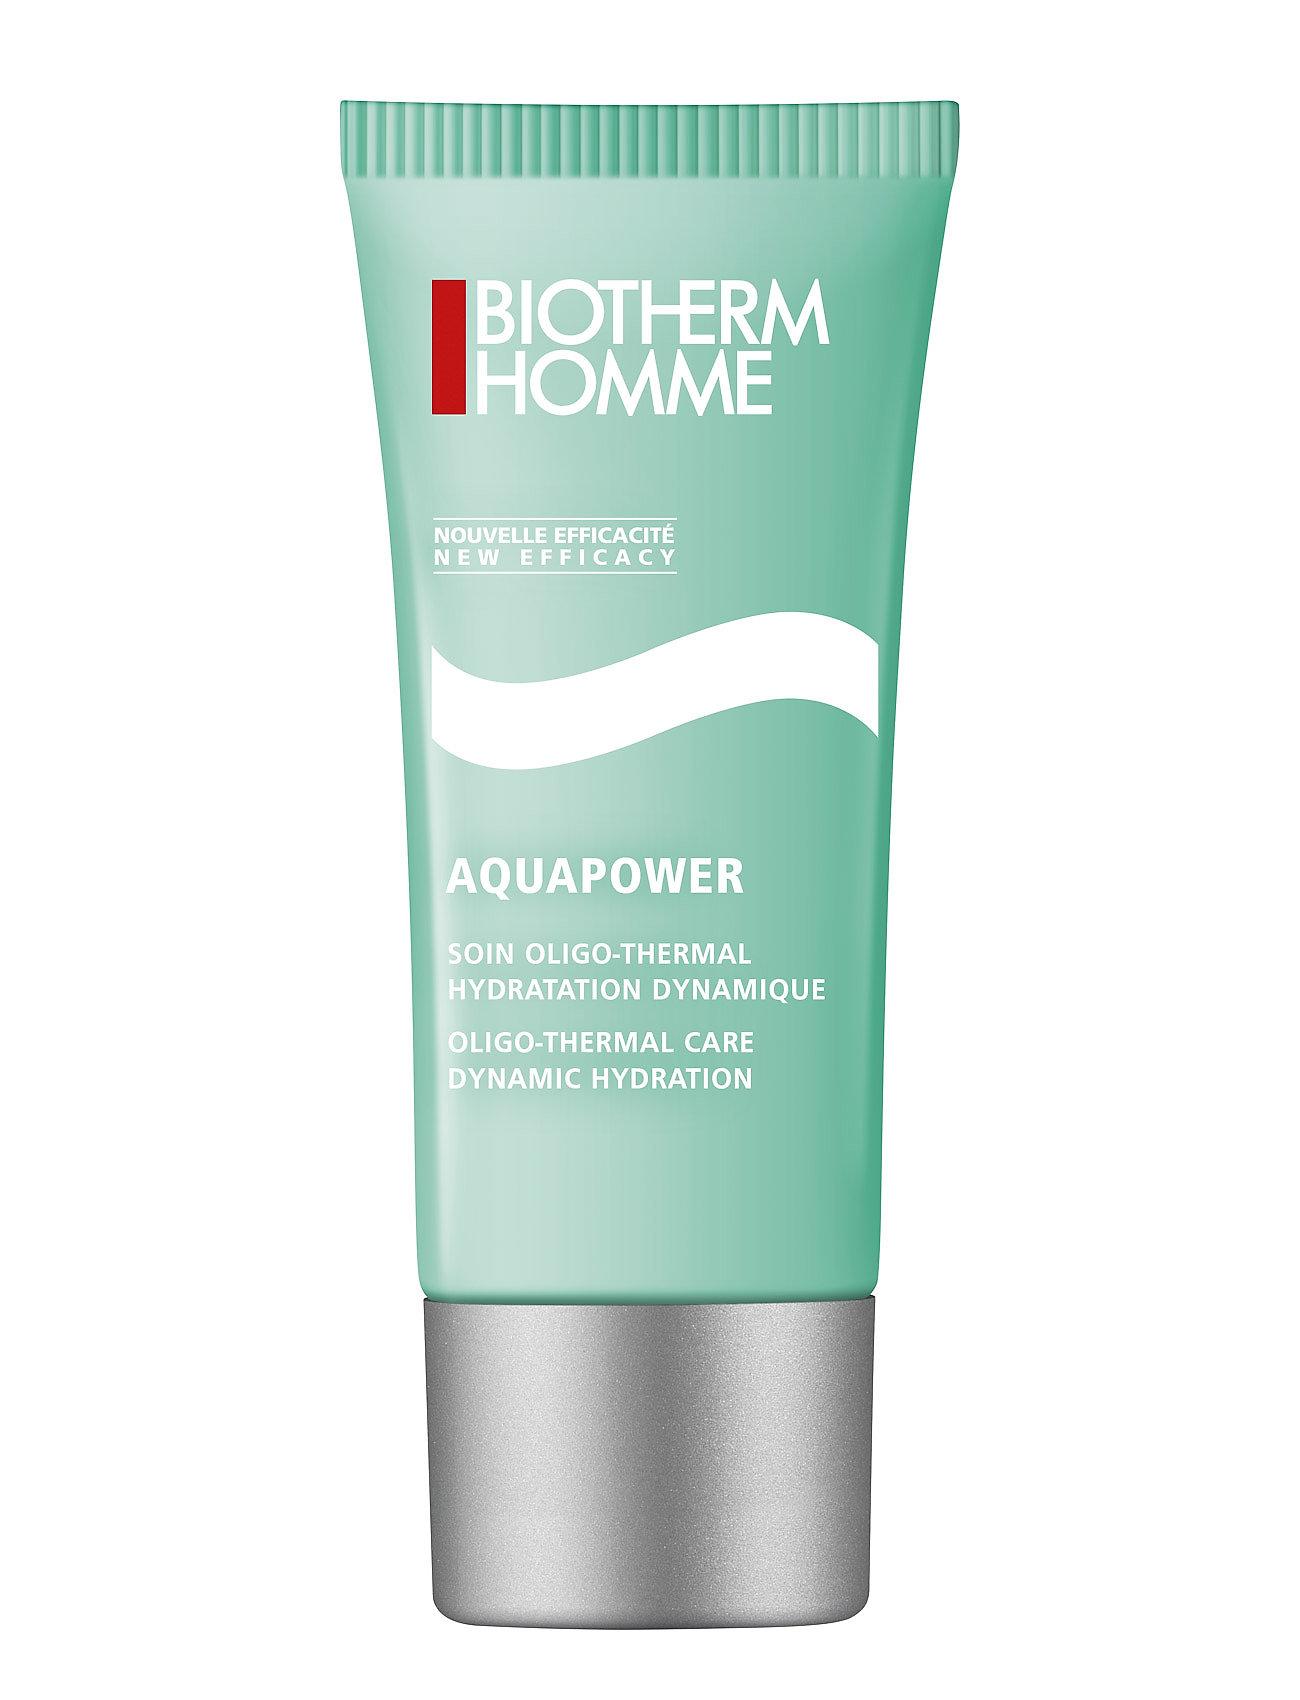 biotherm – Aquapower pnm 30 ml på boozt.com dk